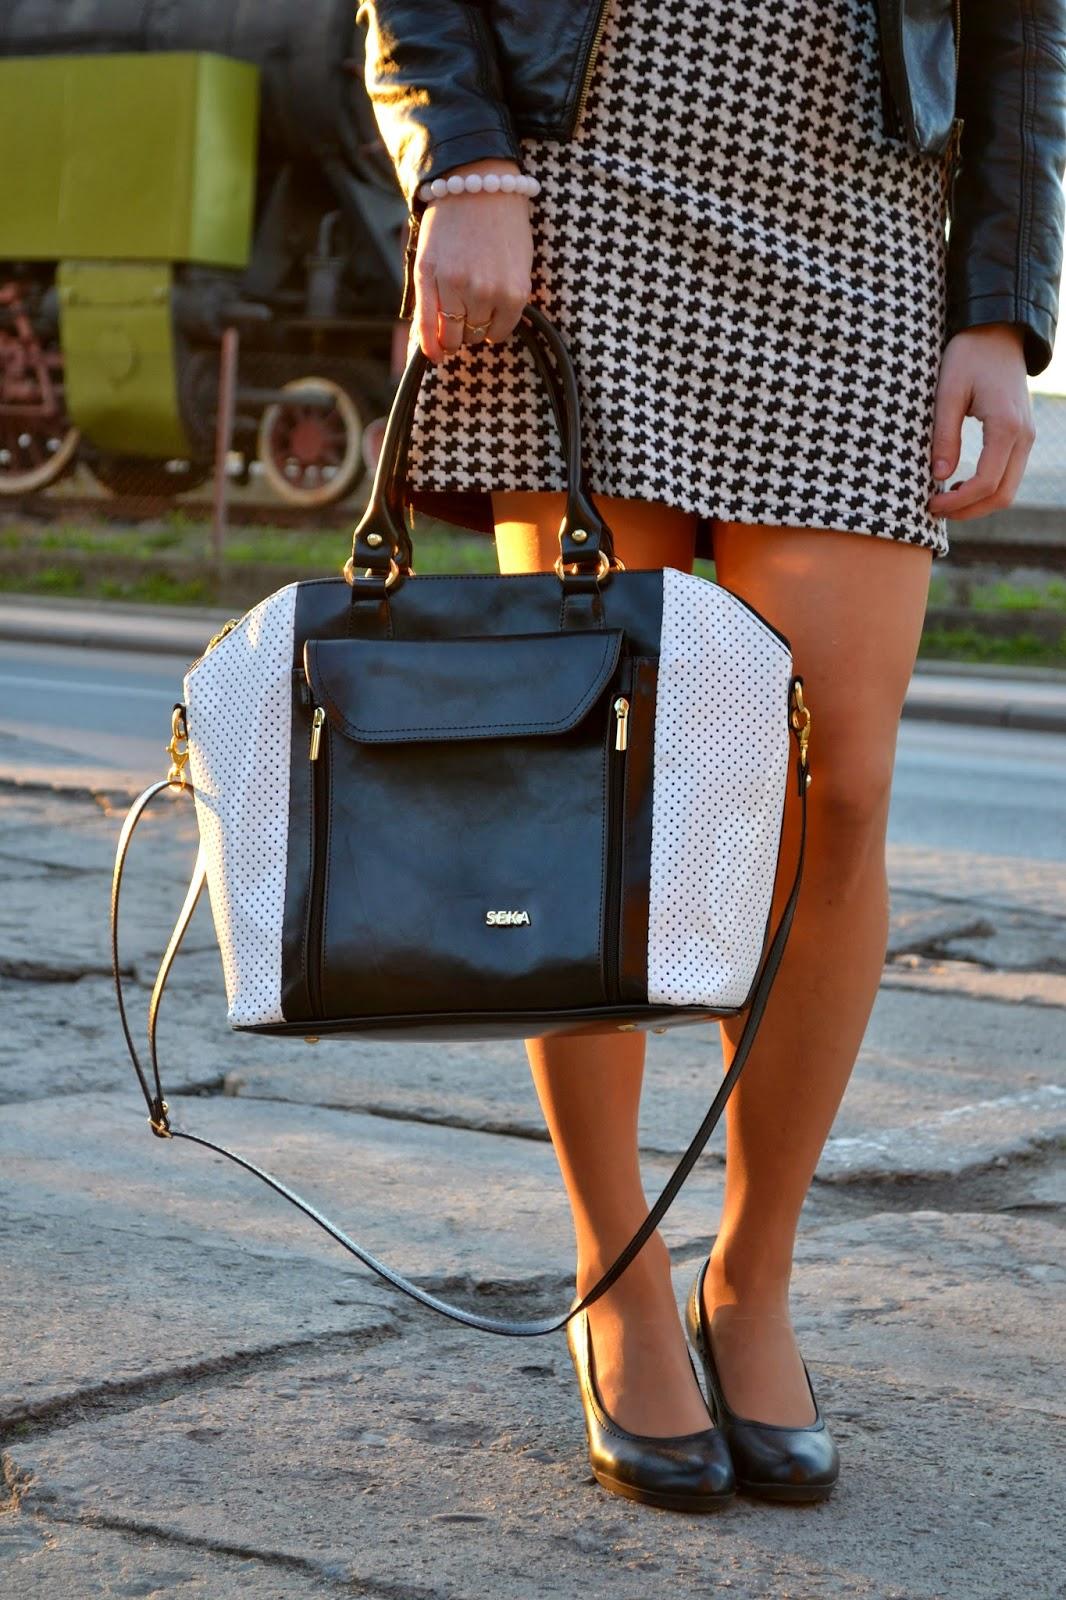 czarno-biała torebka, kuferek, pikowana torebka,